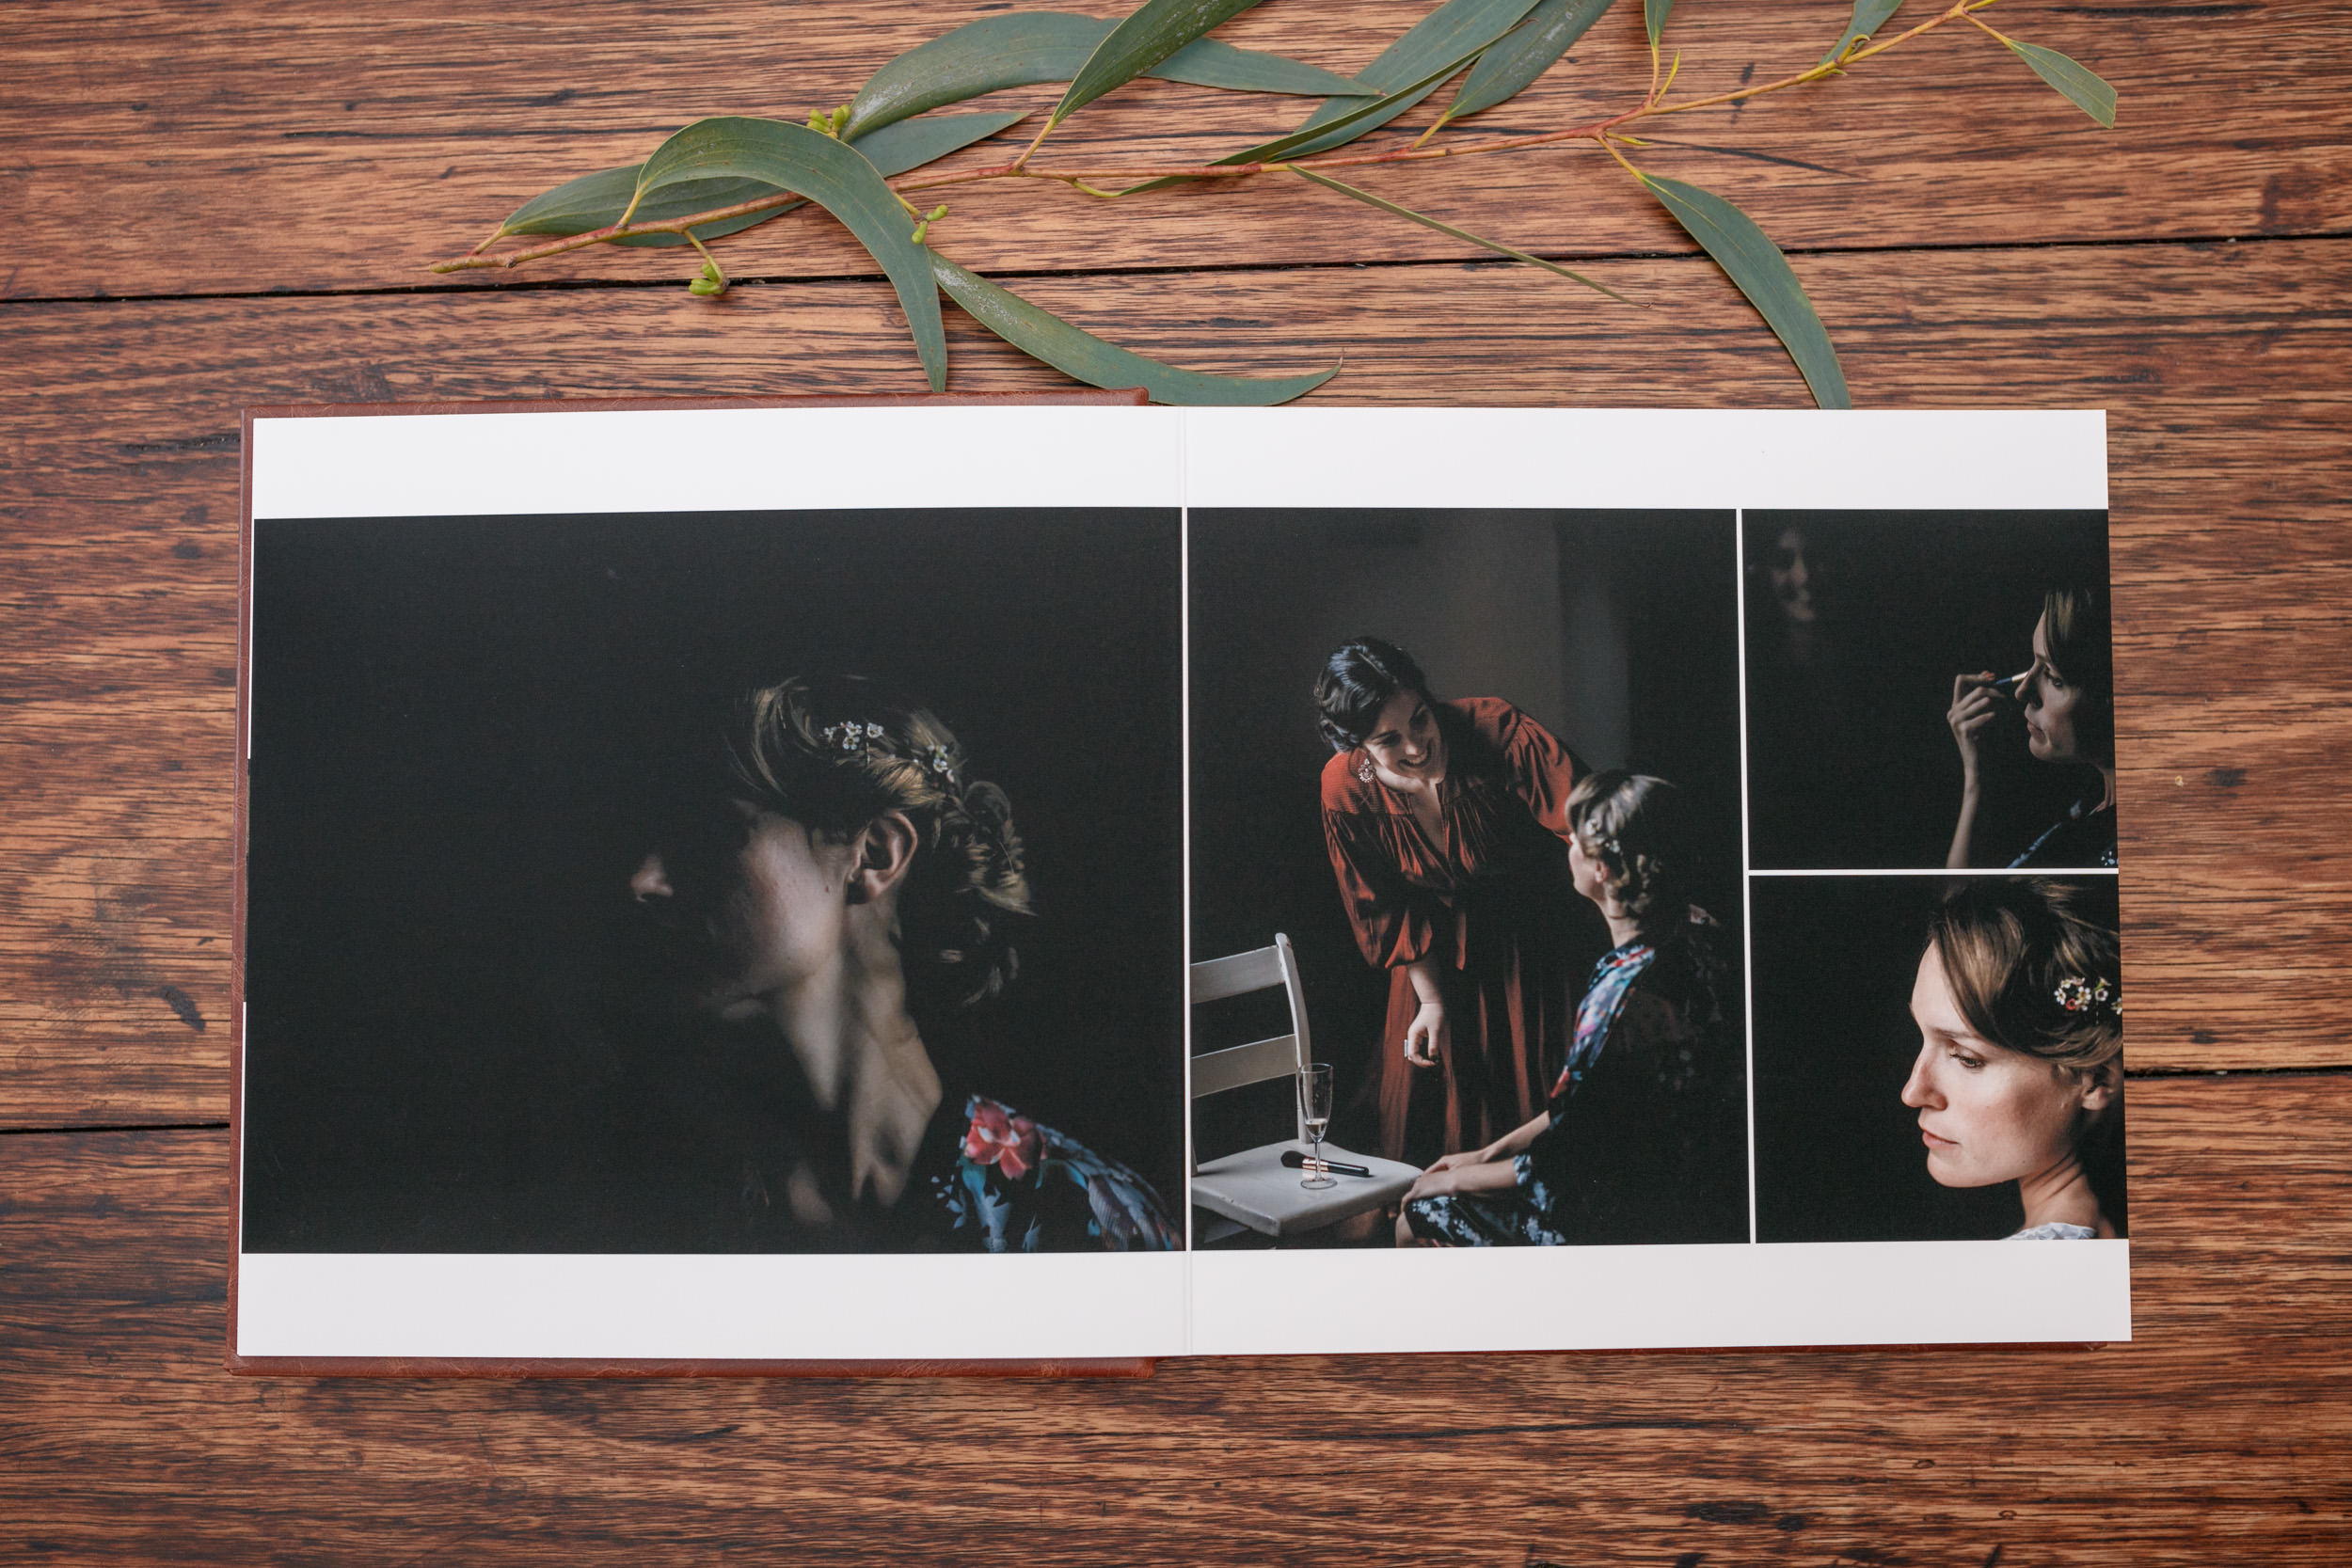 Album photos_TEP_9818.jpg